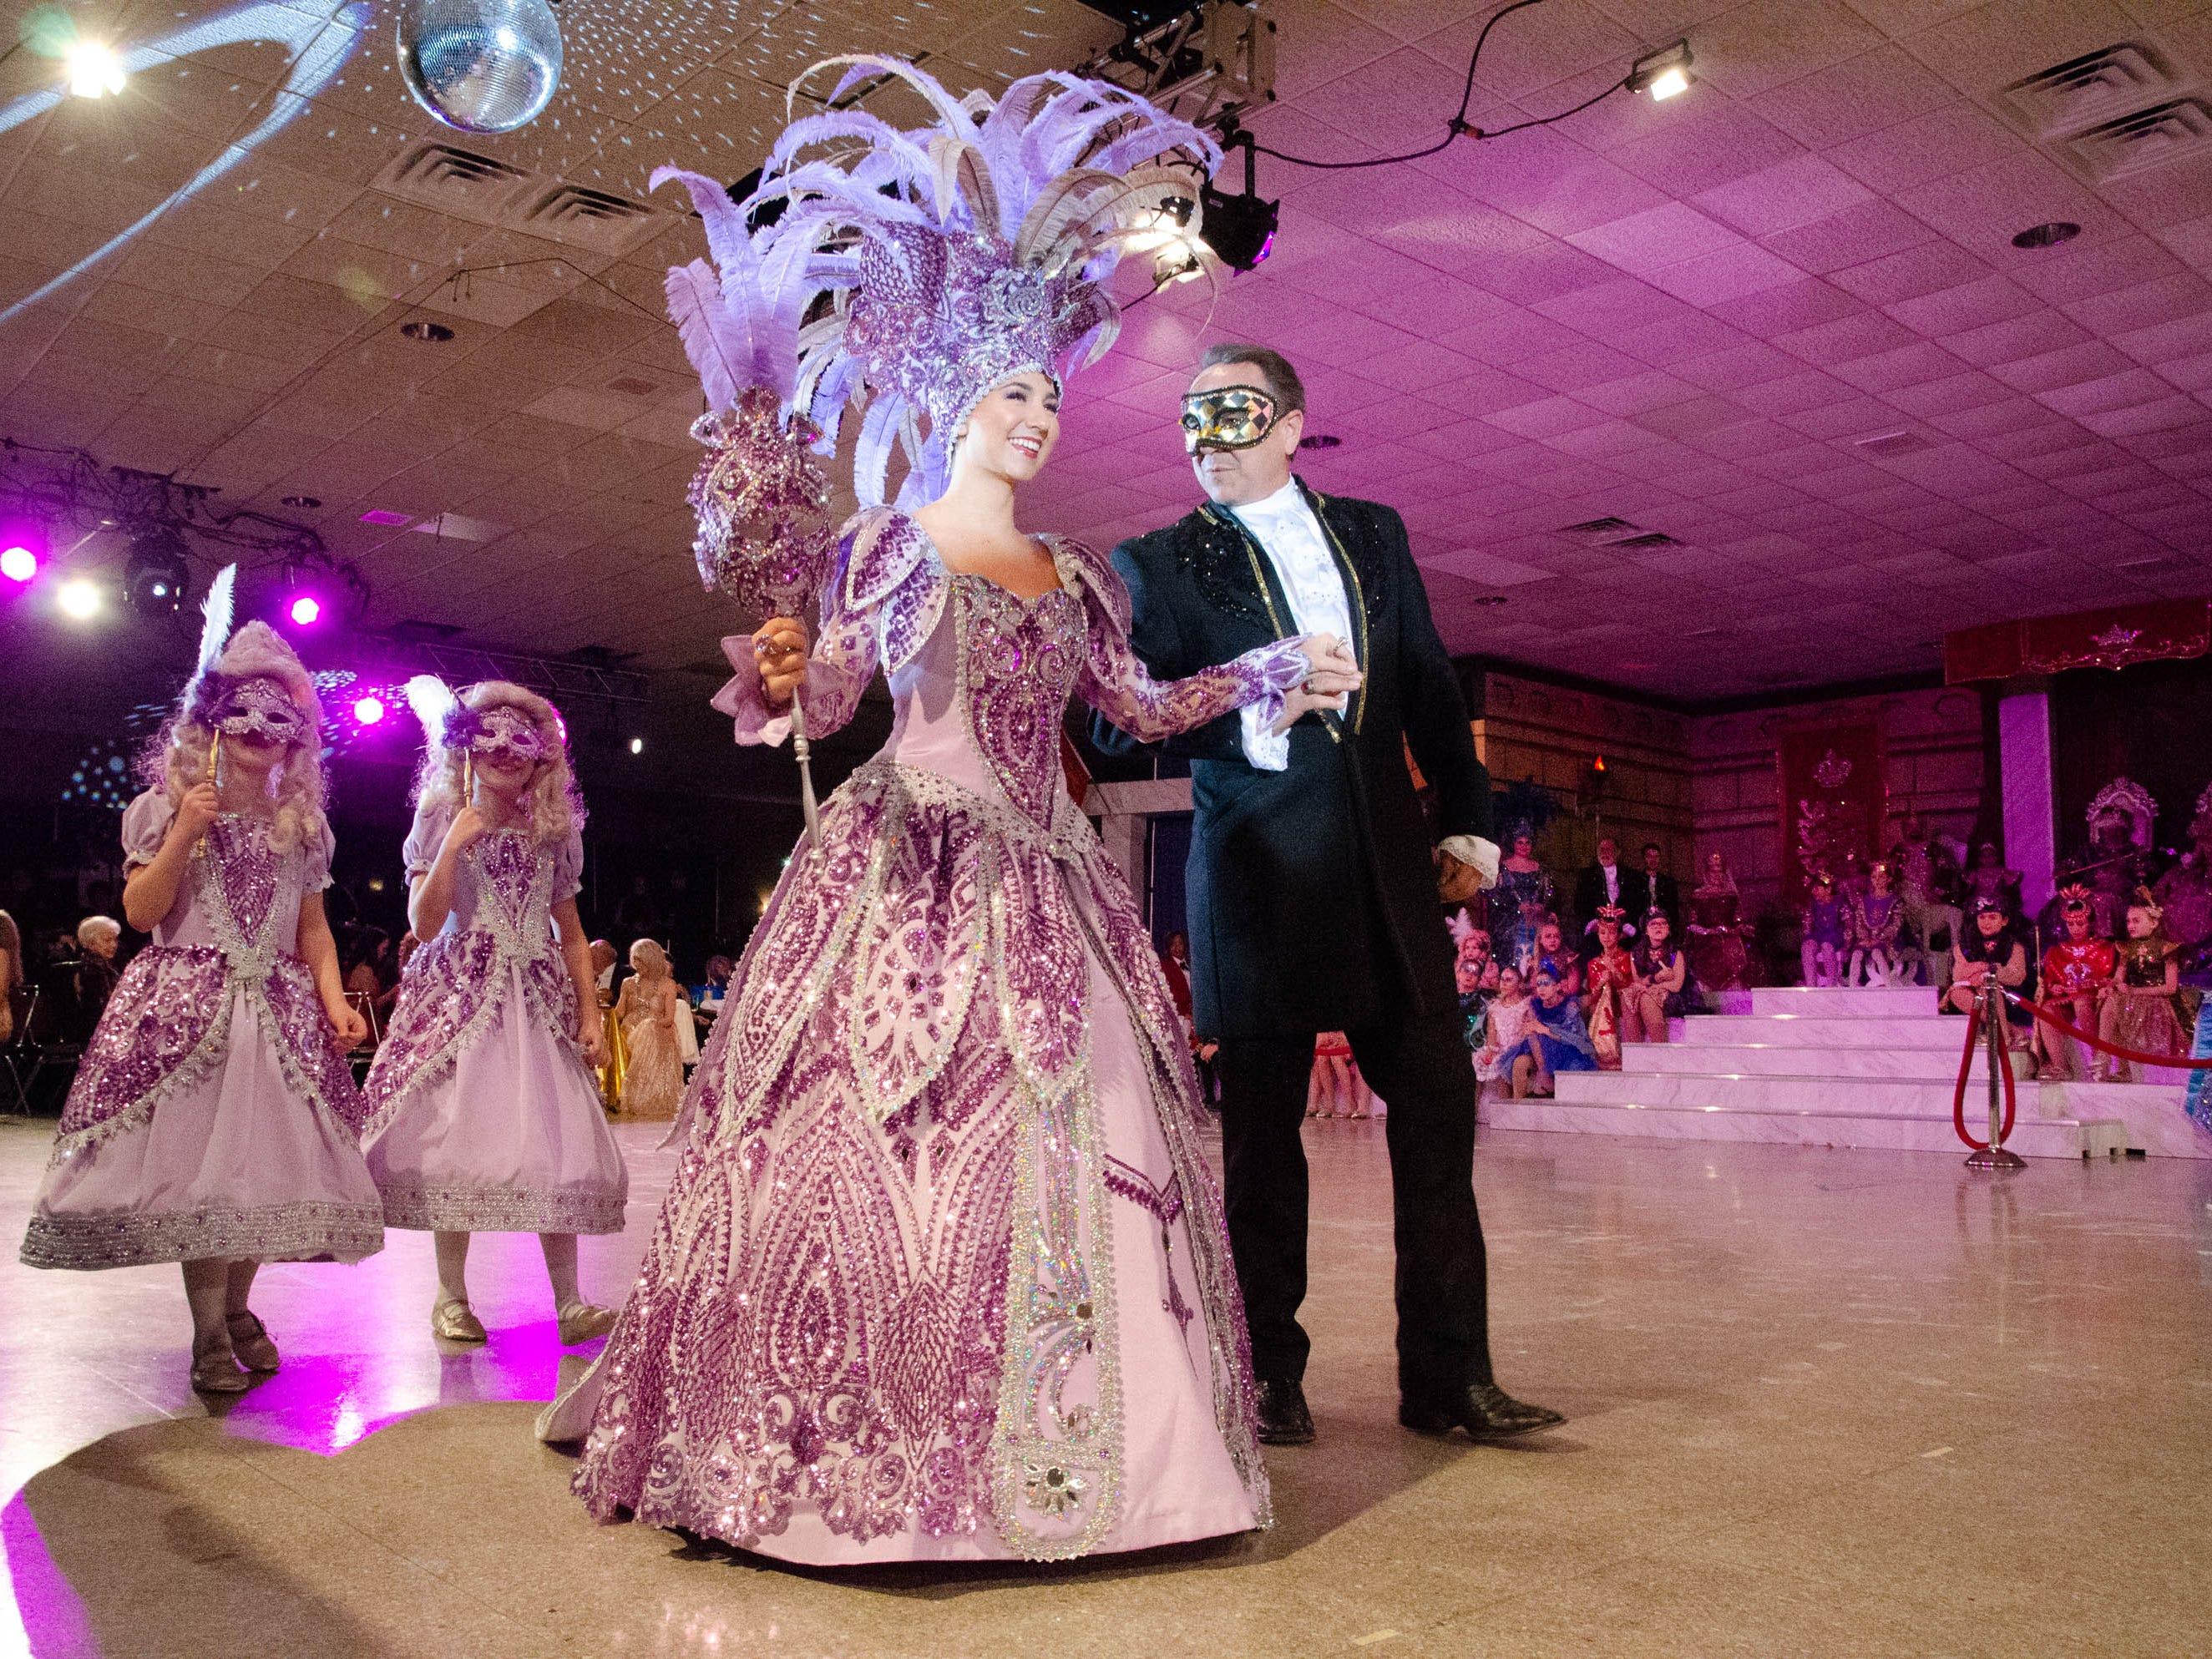 77th Annual Krew de Troubadours Mardi Gras Ball. Katherine Nicole of the House of Crochet (The Winged Pegasus).